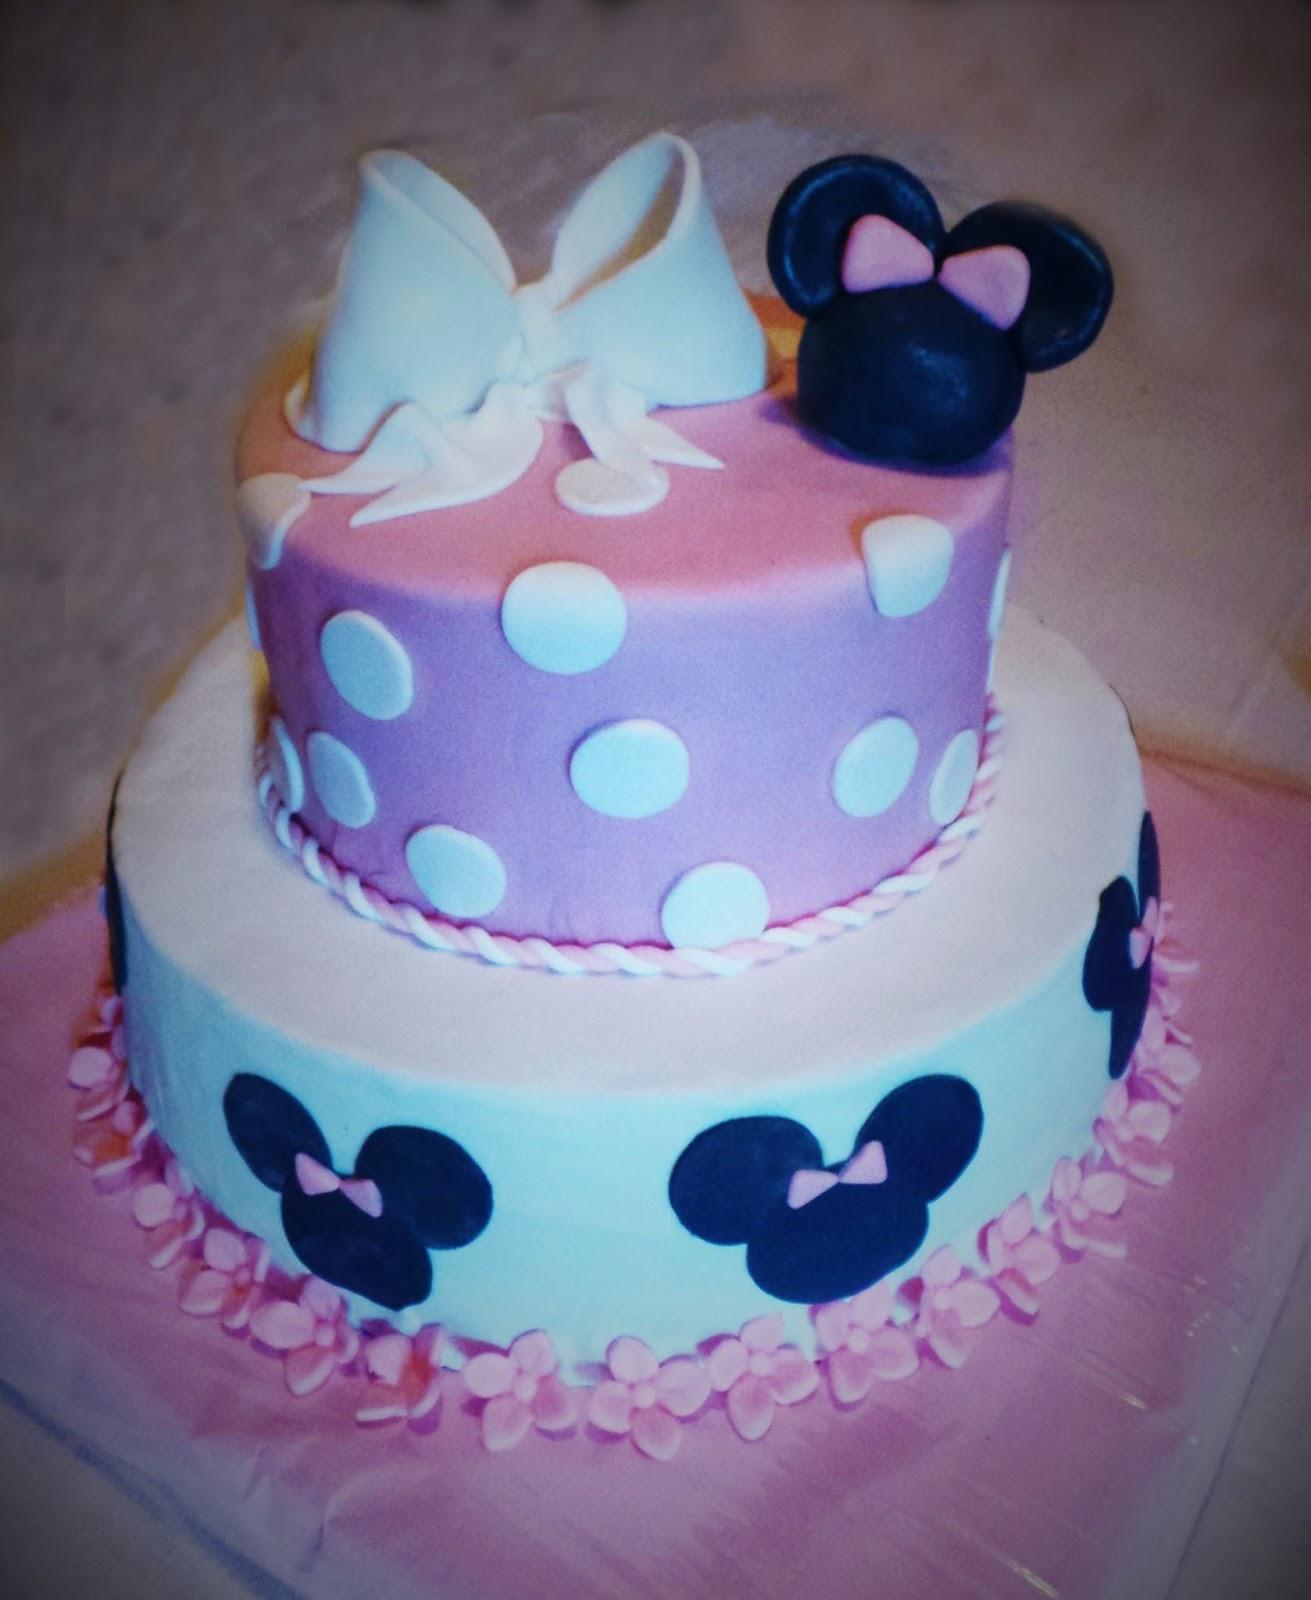 Sandy S Kitchendreams Mini Maus Kuchen Mit Schoko Erdbeere